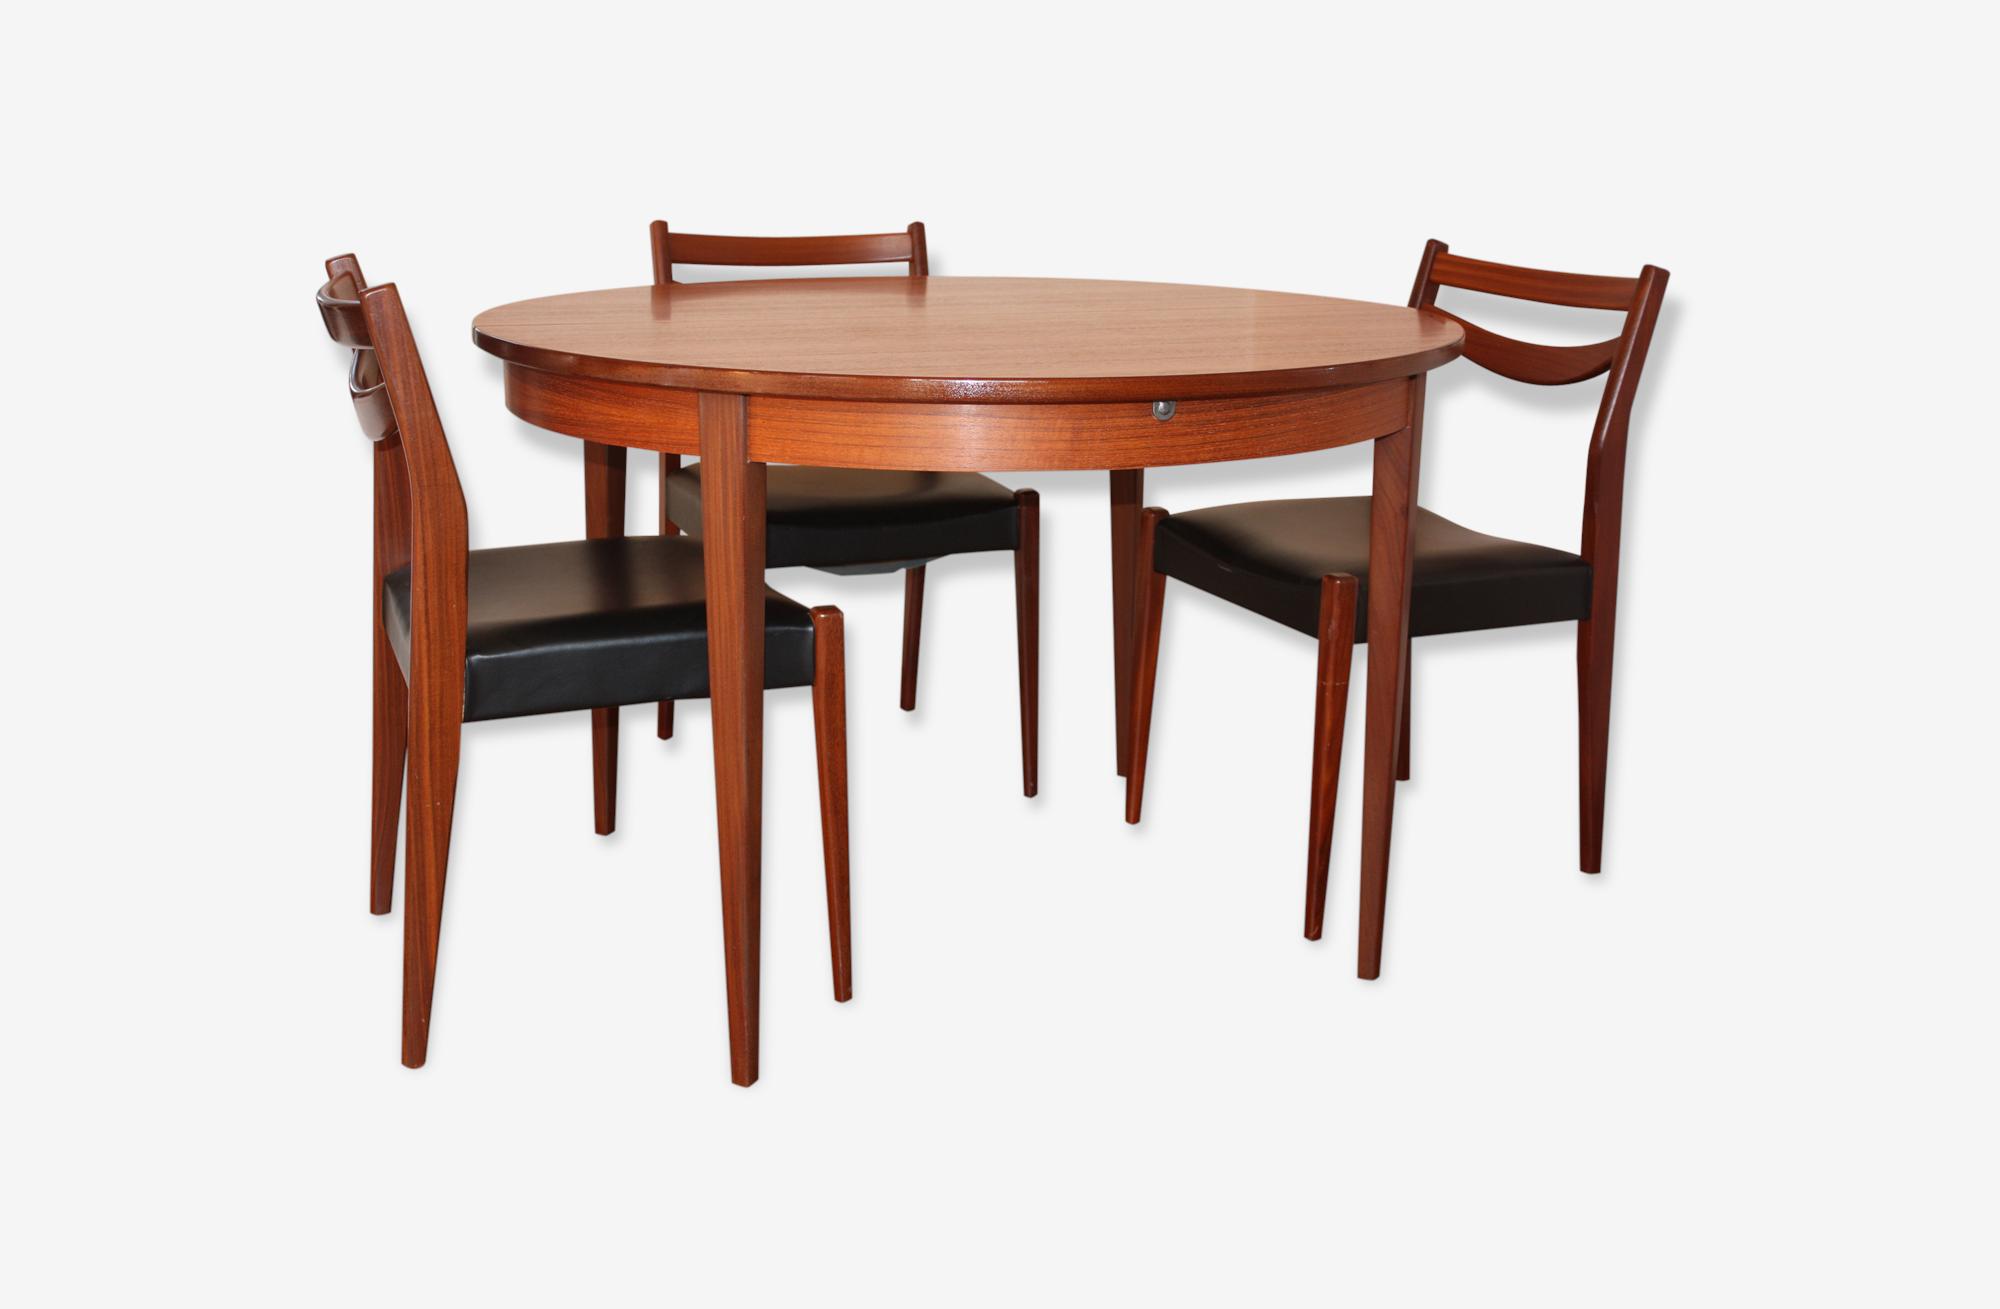 Table ronde teck extensible scandinave